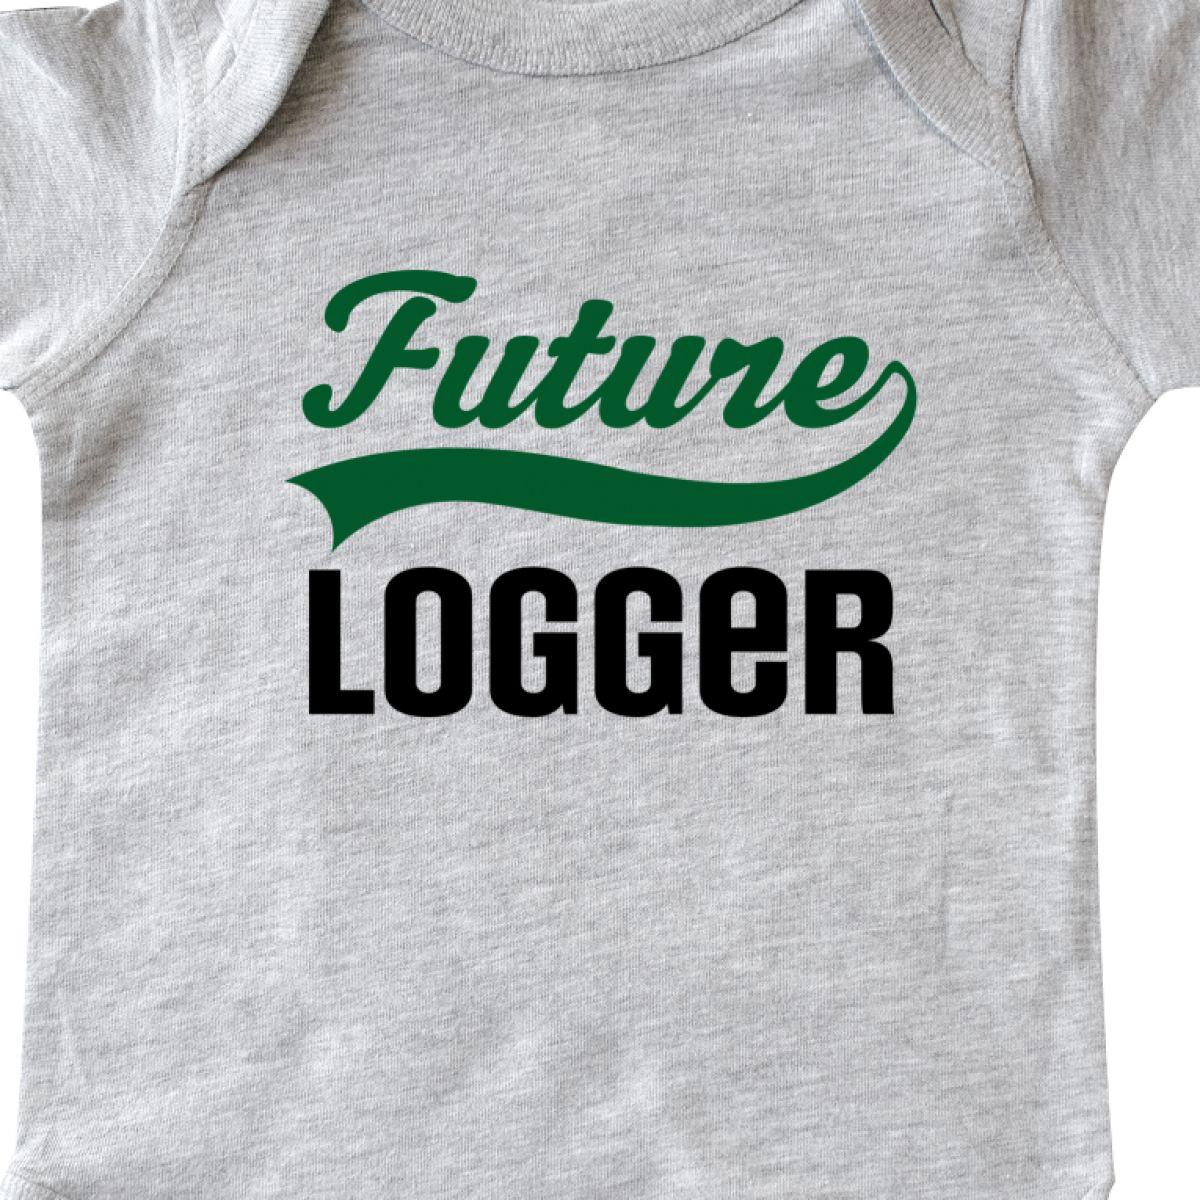 Inktastic Logging Future Logger Infant Creeper Training Lumber Wood Job Apparel